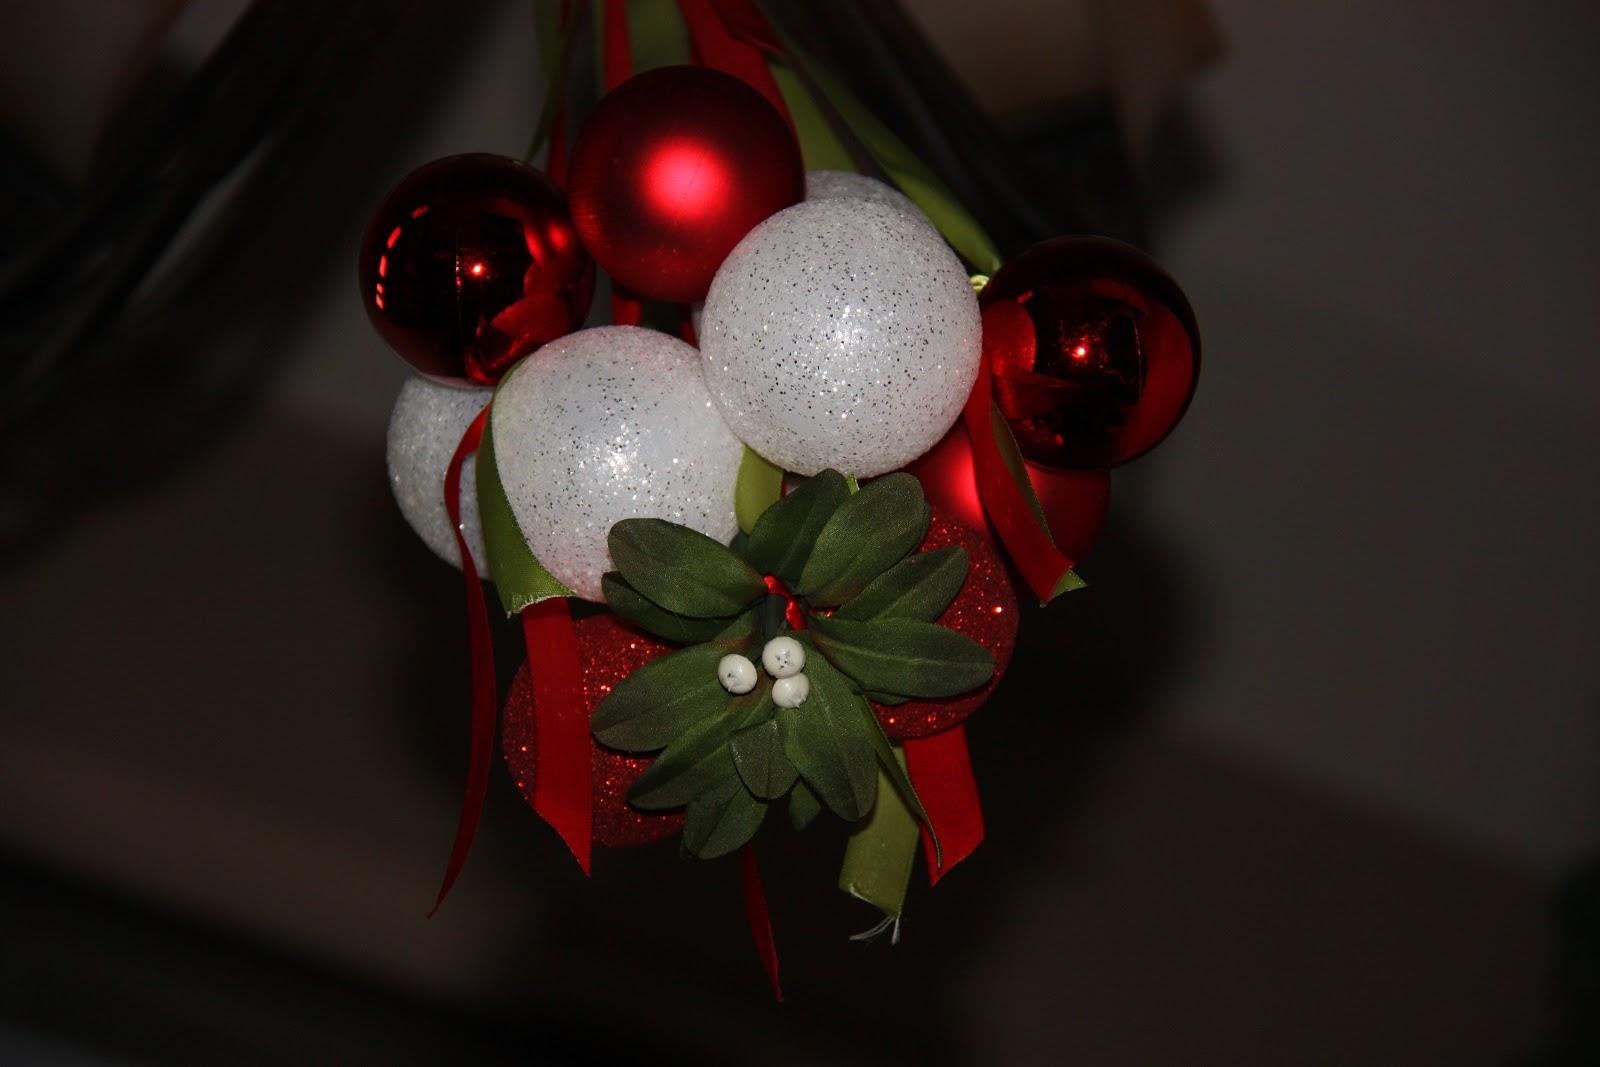 Mistletoe And Ornament Chandelier